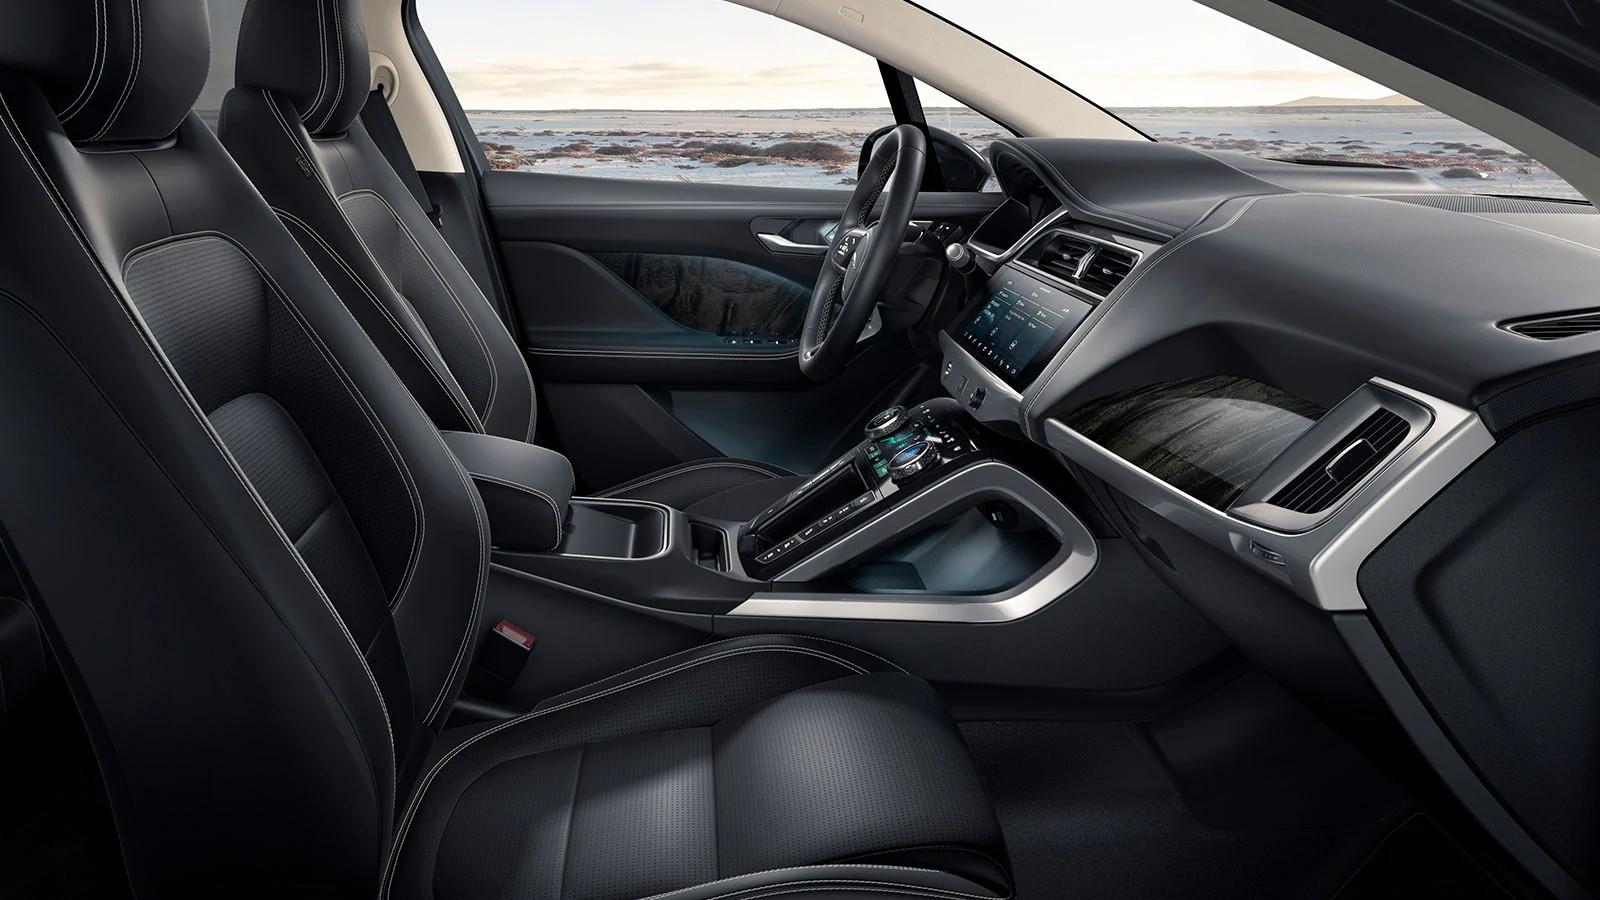 Jaguar I-pace interior.jpg (249 KB)